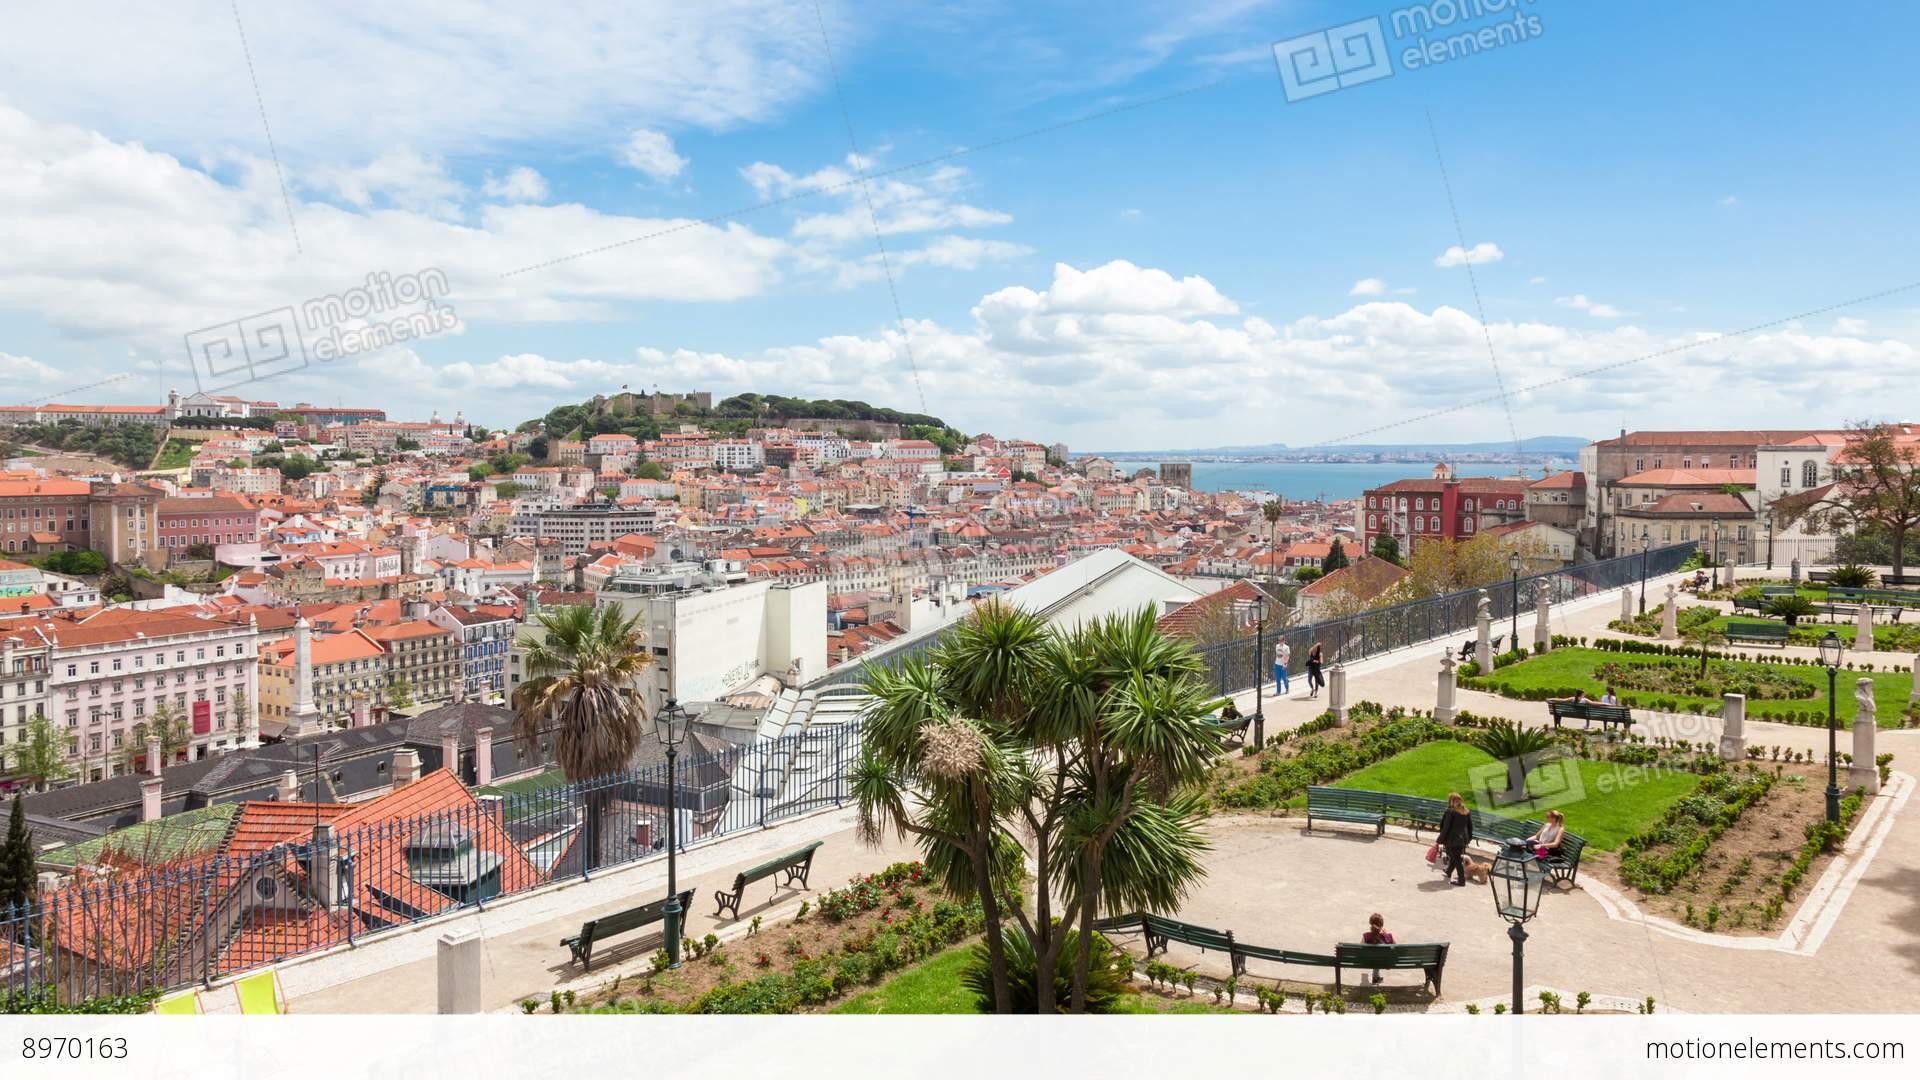 4K Timelapse Of Lisbon Rooftop From Sao Pedro De Alcantara.